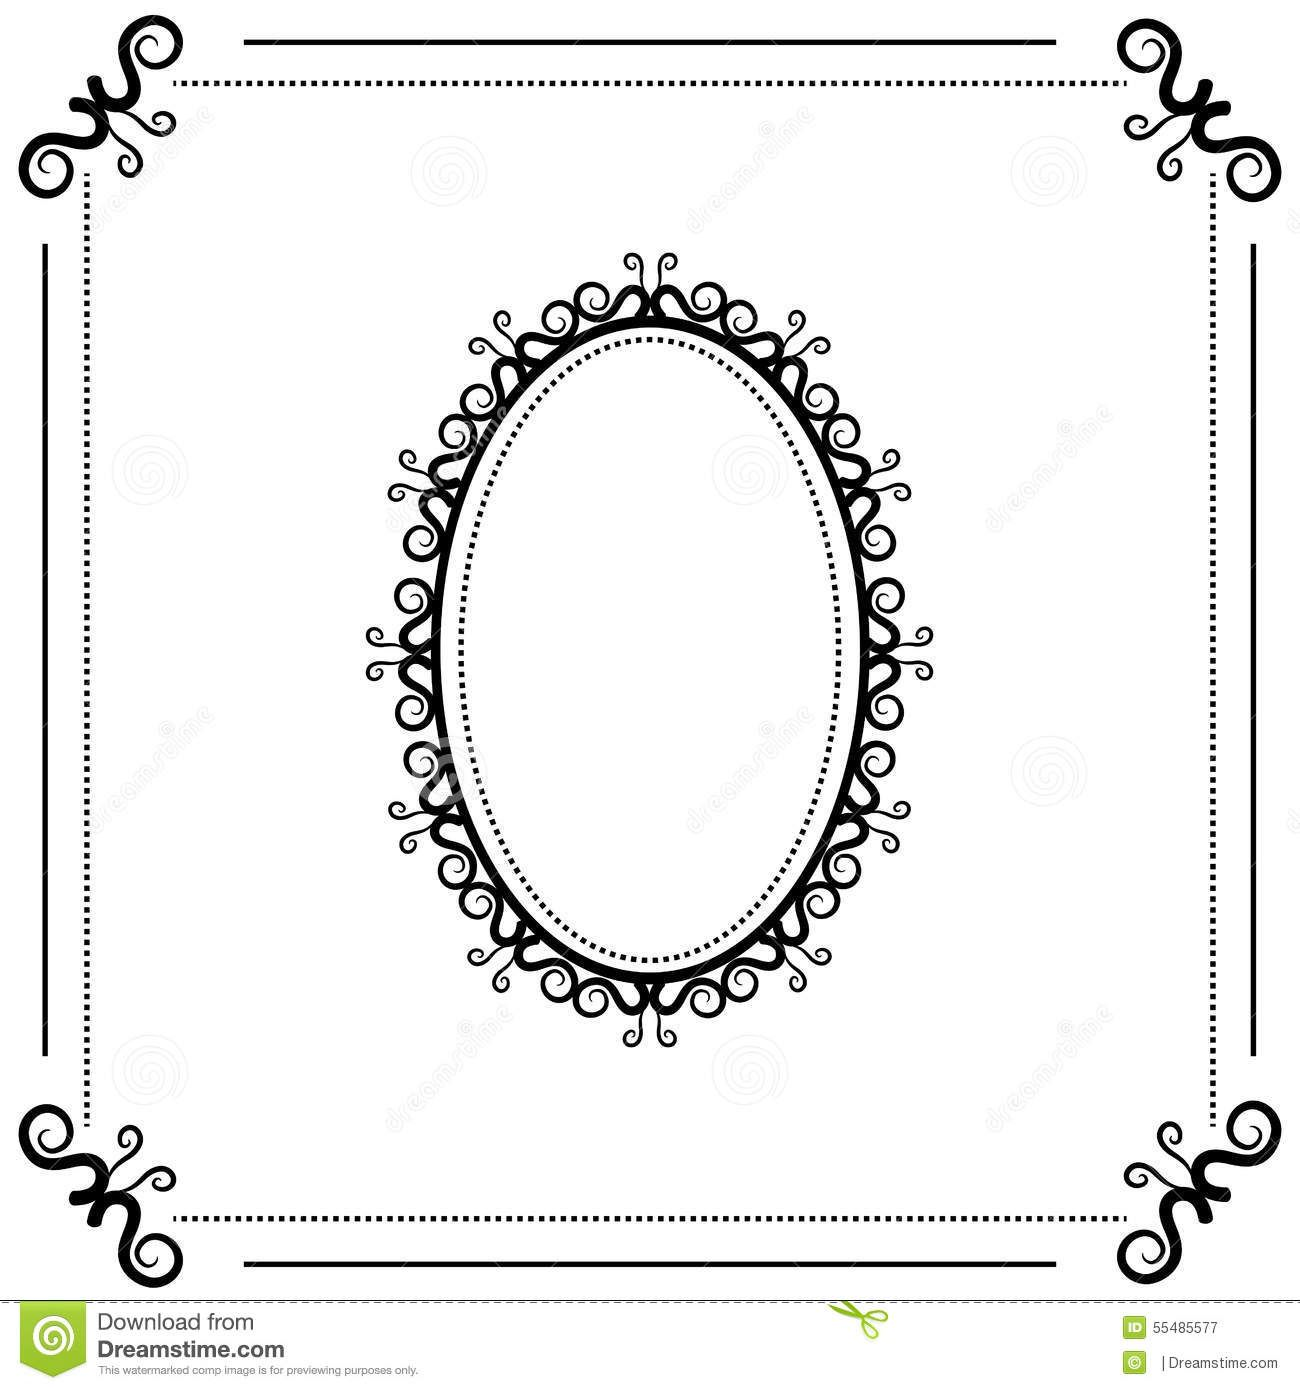 براويز صور 2020 اطارات مزخرفة للصور Frame Pictures Mirror